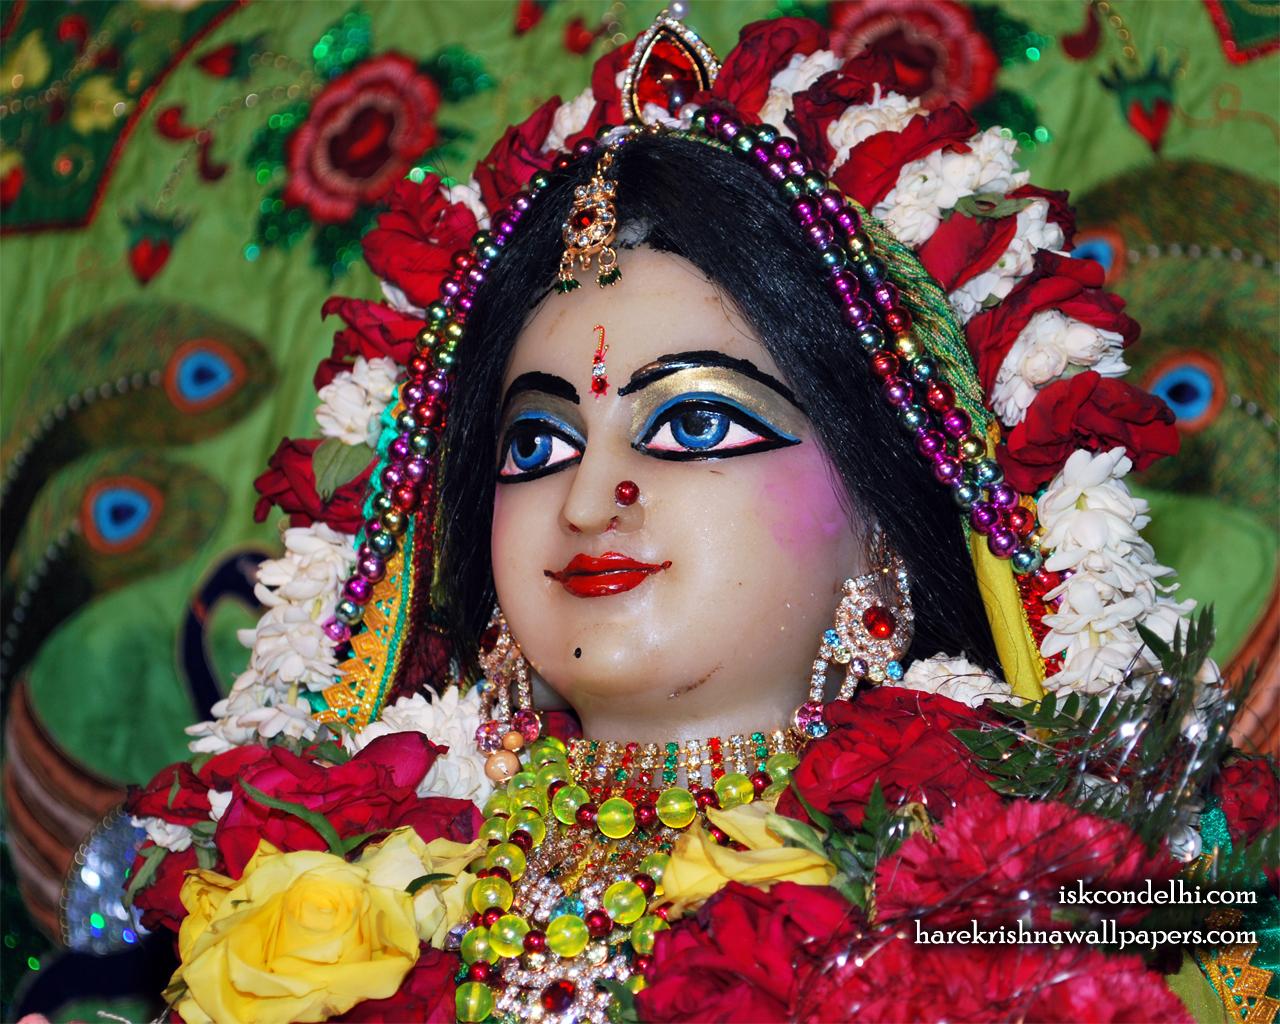 Sri Radha Close up Wallpaper (027) Size 1280x1024 Download